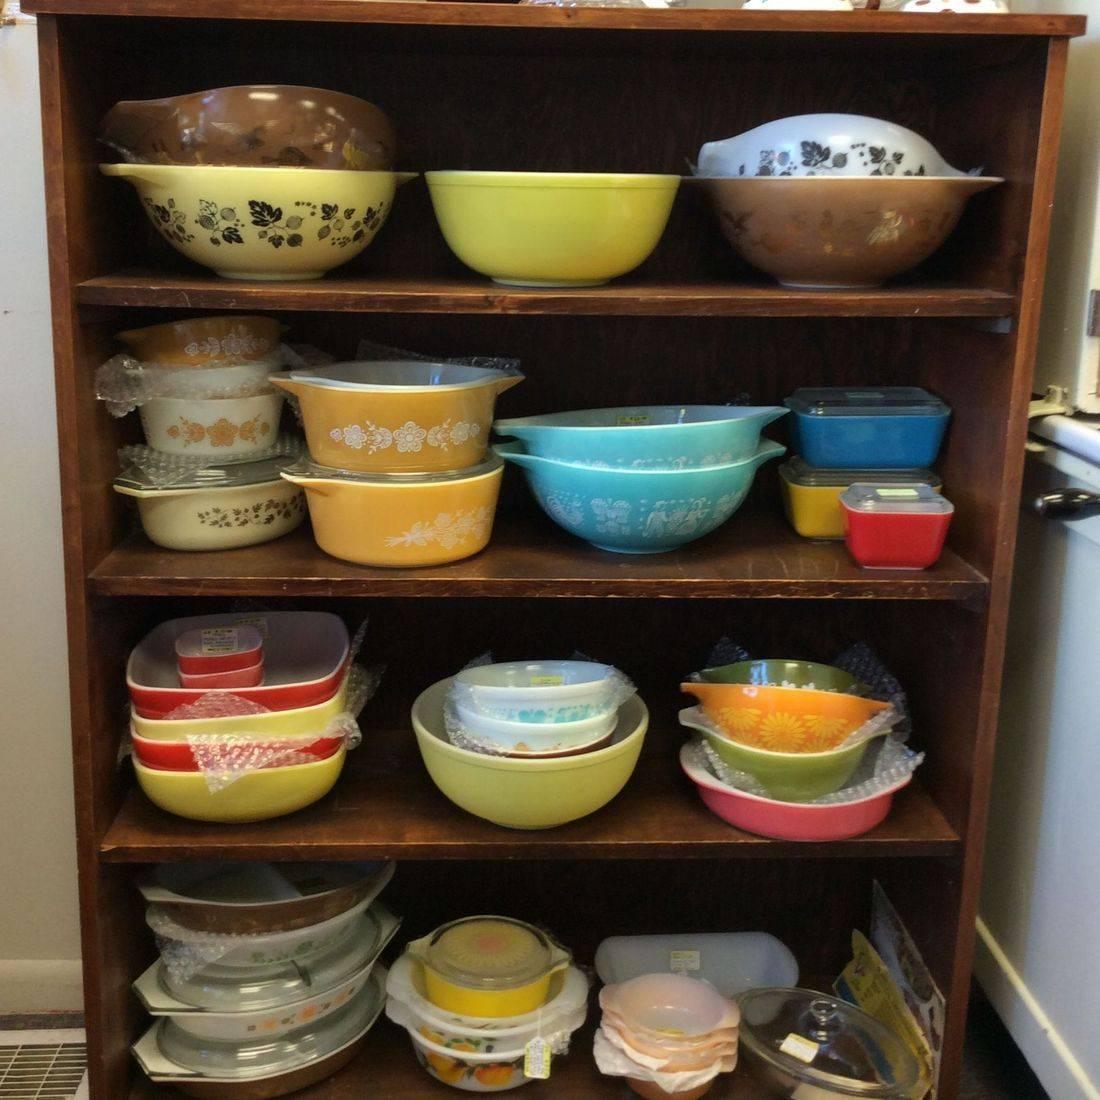 Vintage Pyrex Mixing Bowls   $7.00 - $35.00